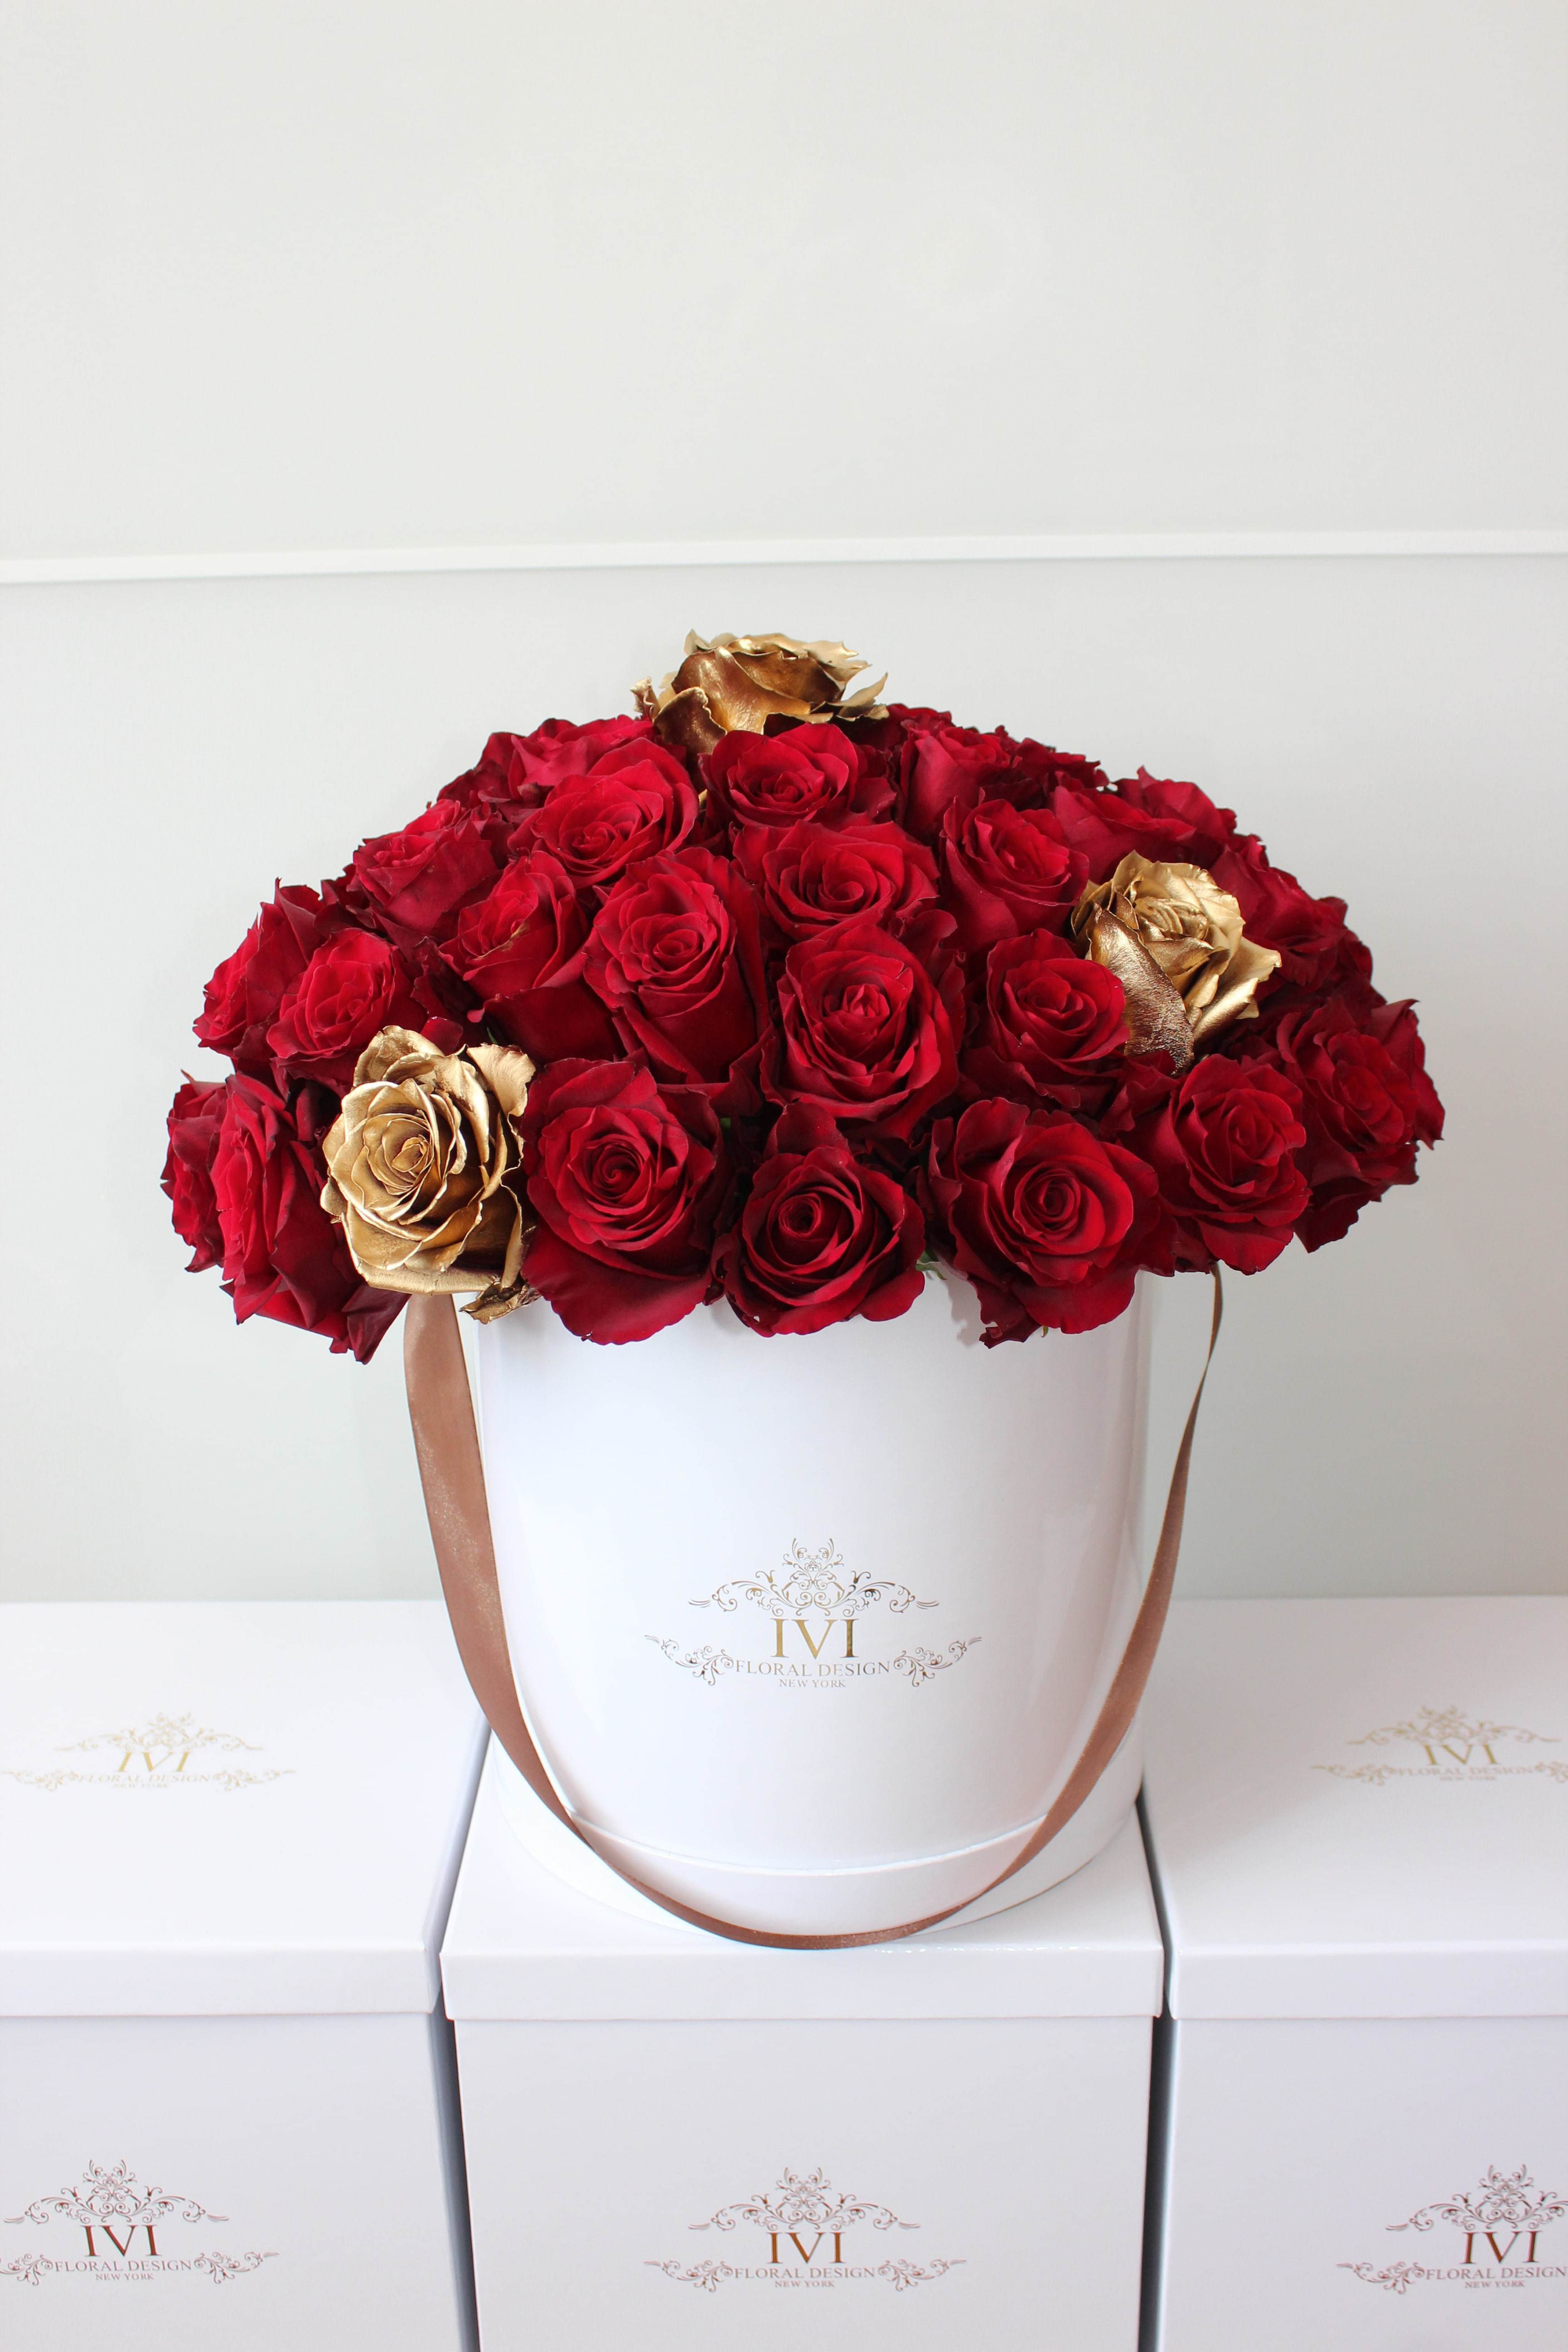 Ivi floral design new york ny 10016 yp dhlflorist Gallery